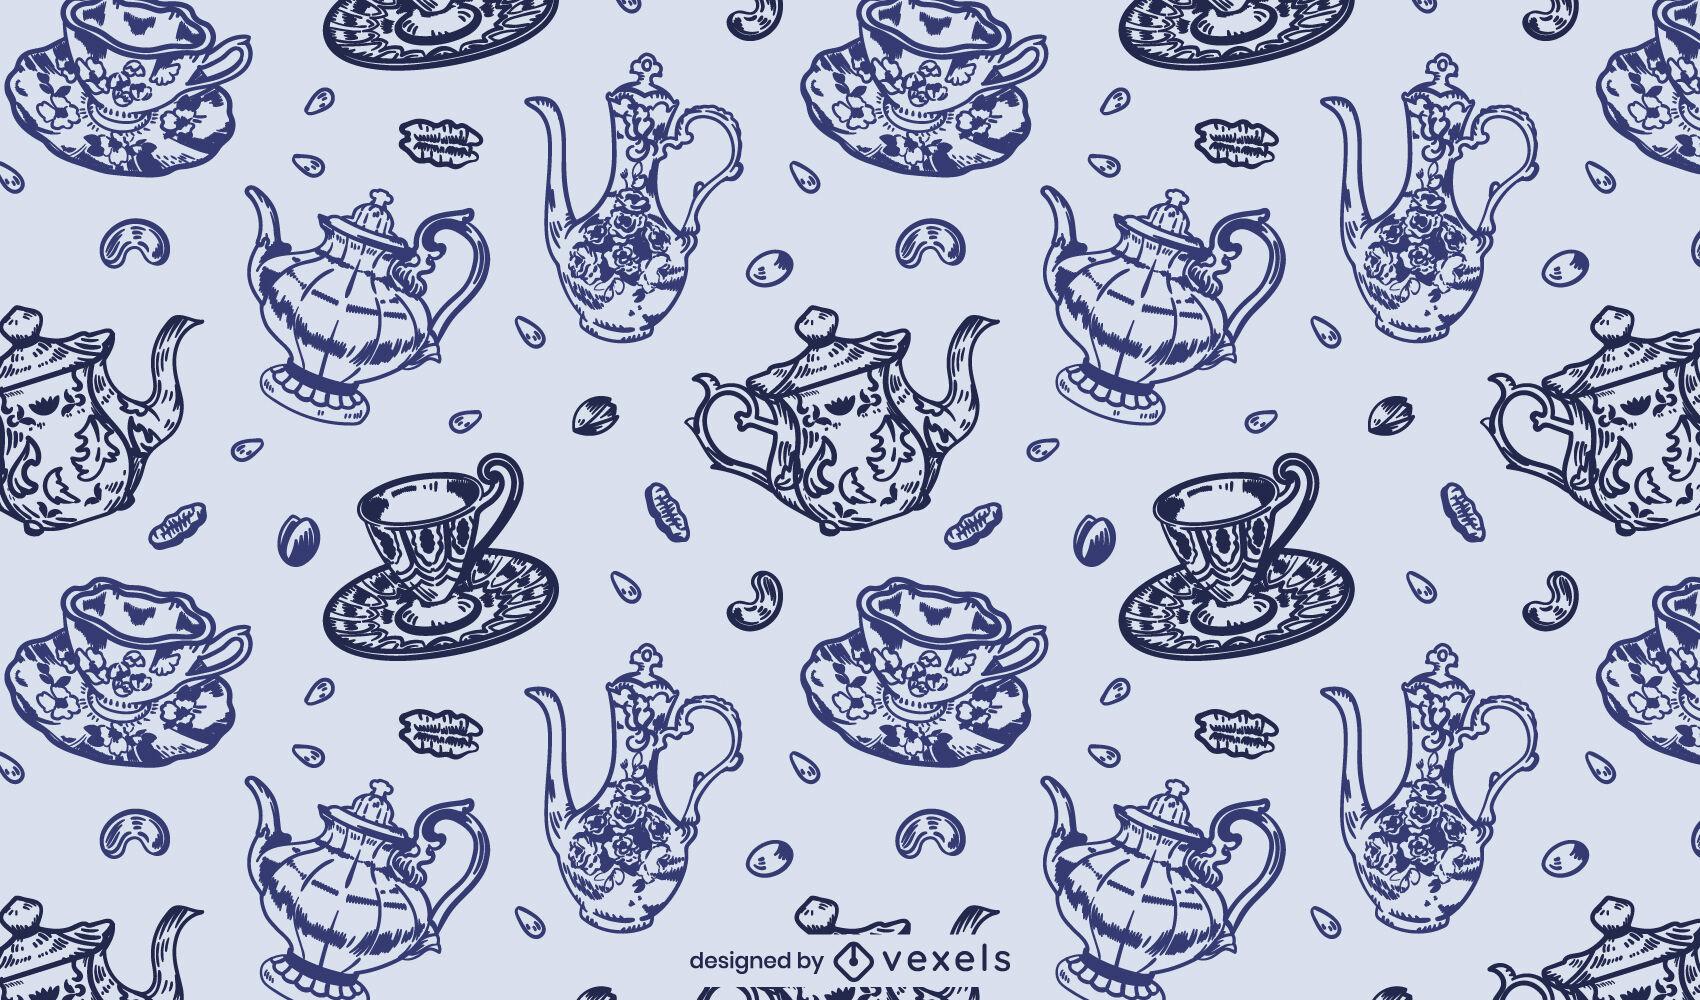 Vintage Teekanne und Teetasse Musterdesign